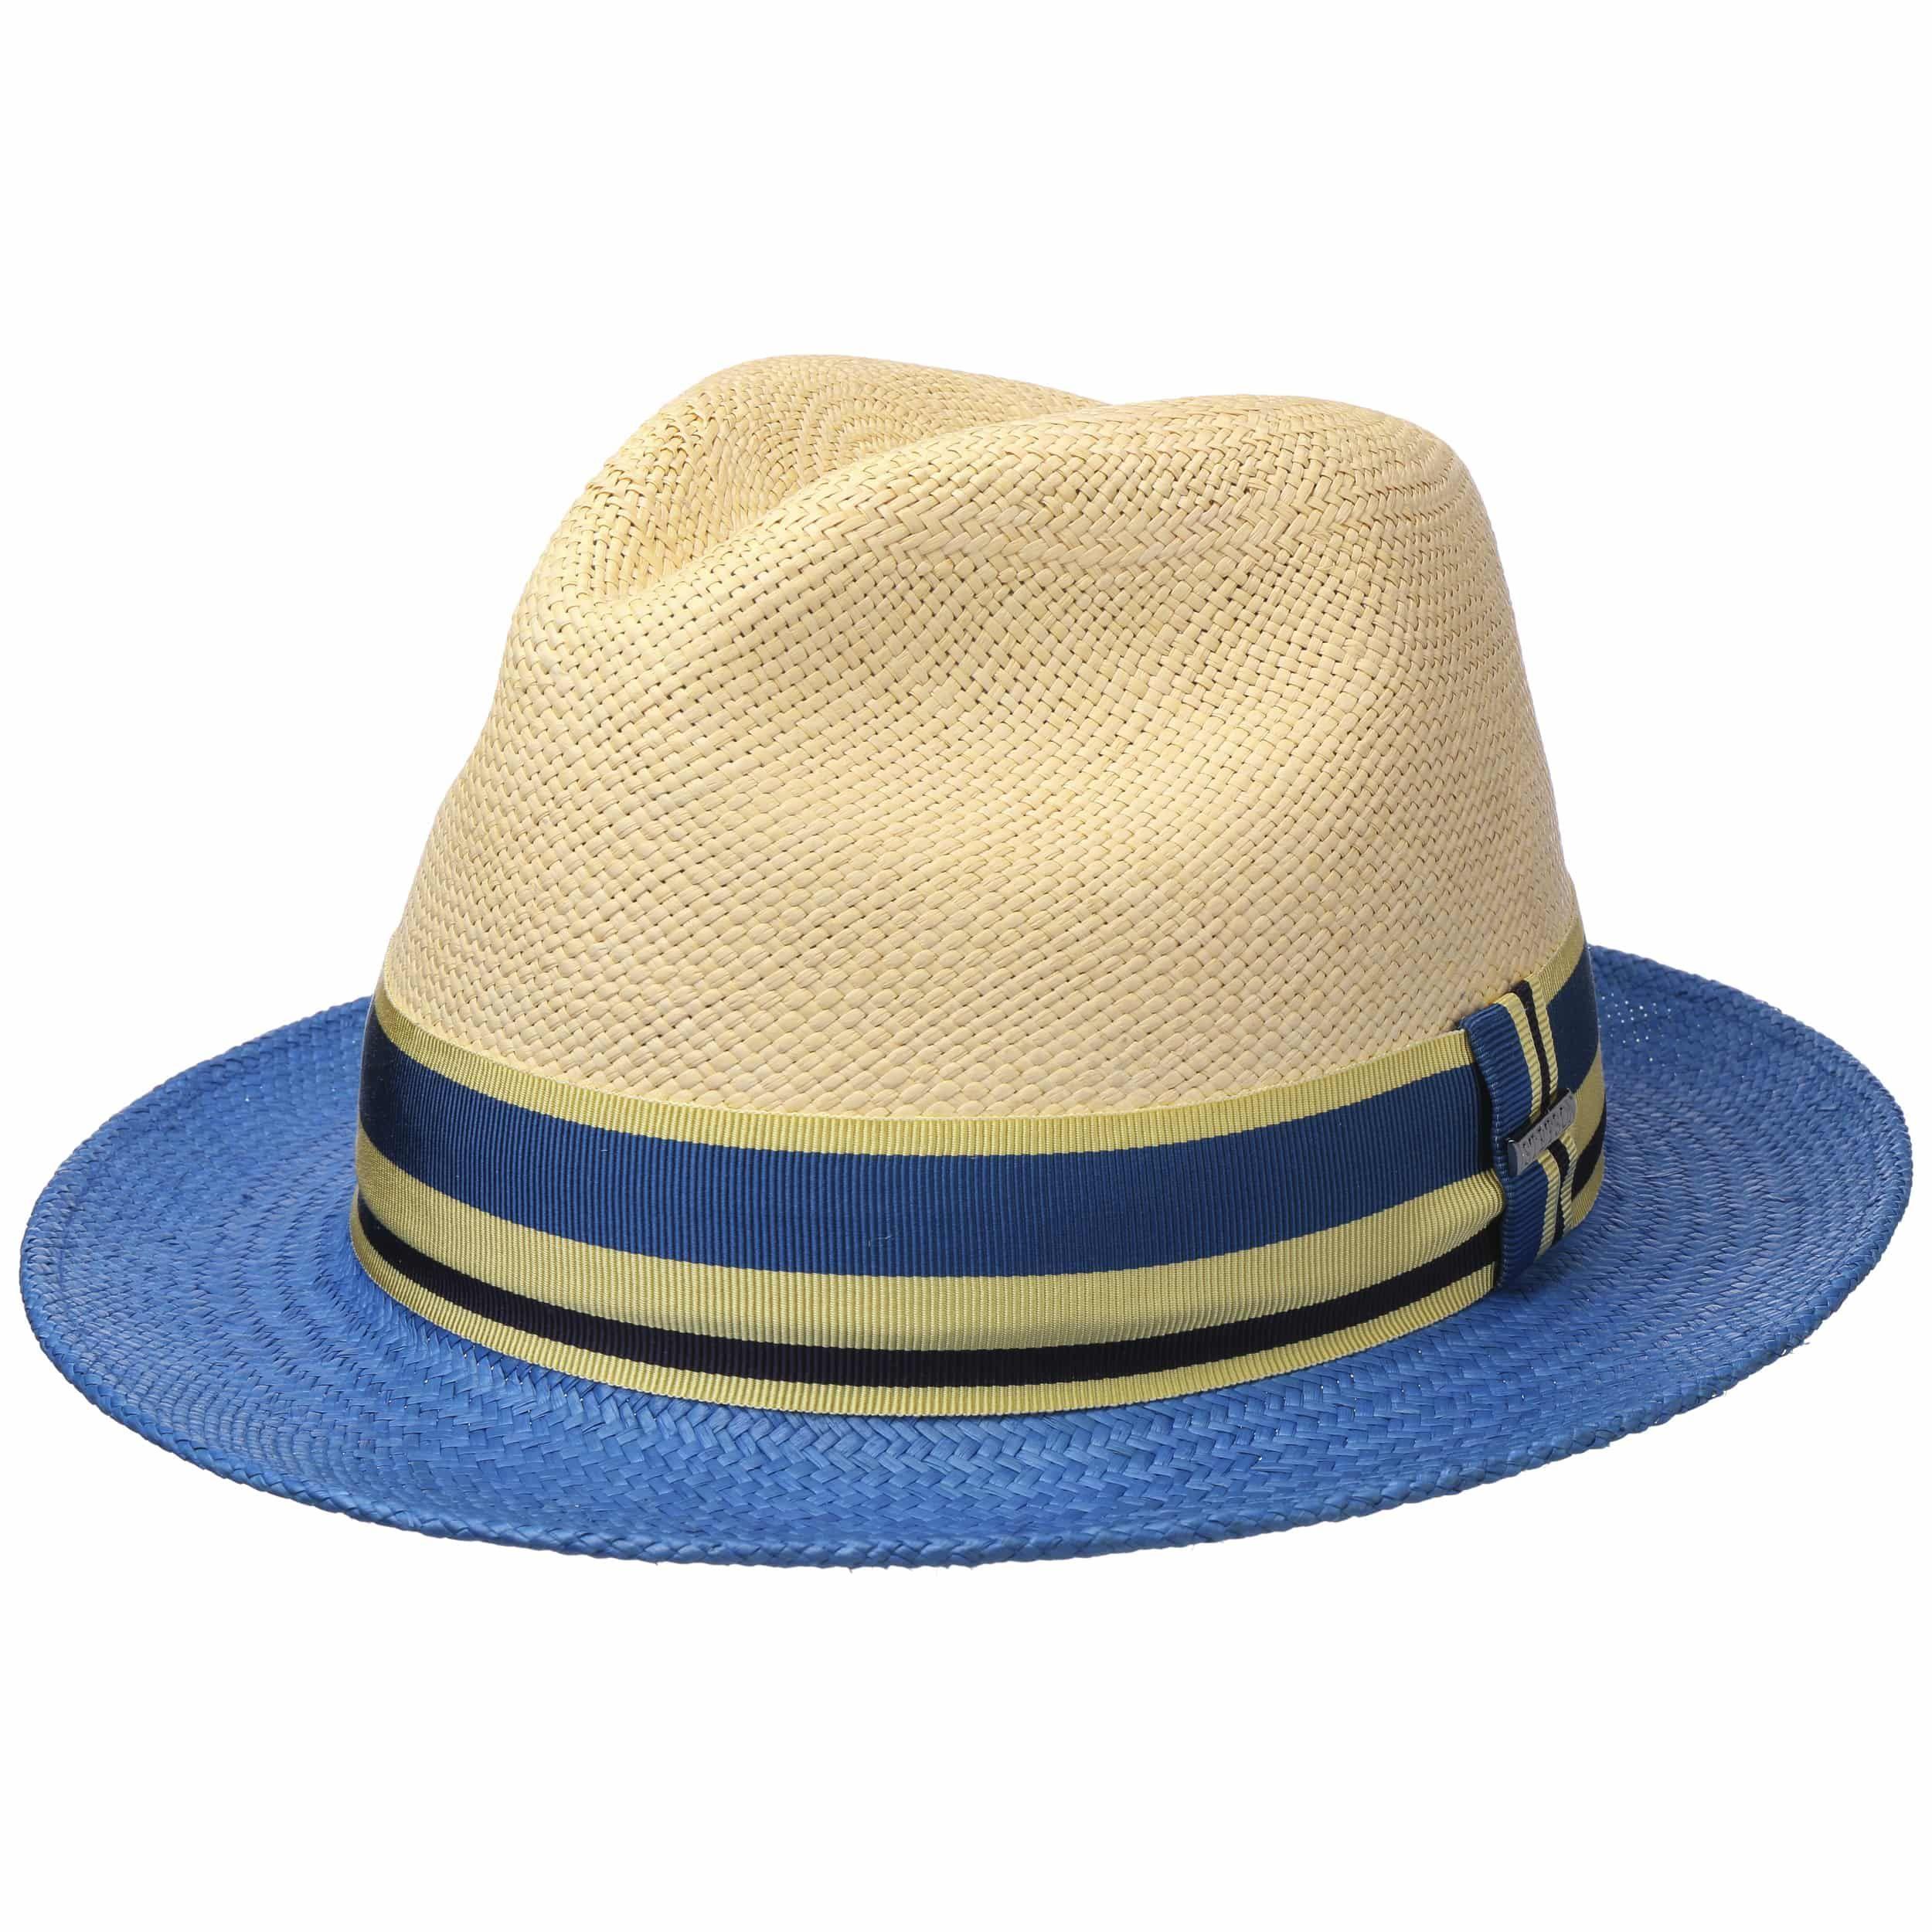 Recamo Player Panama Hat nature-blue